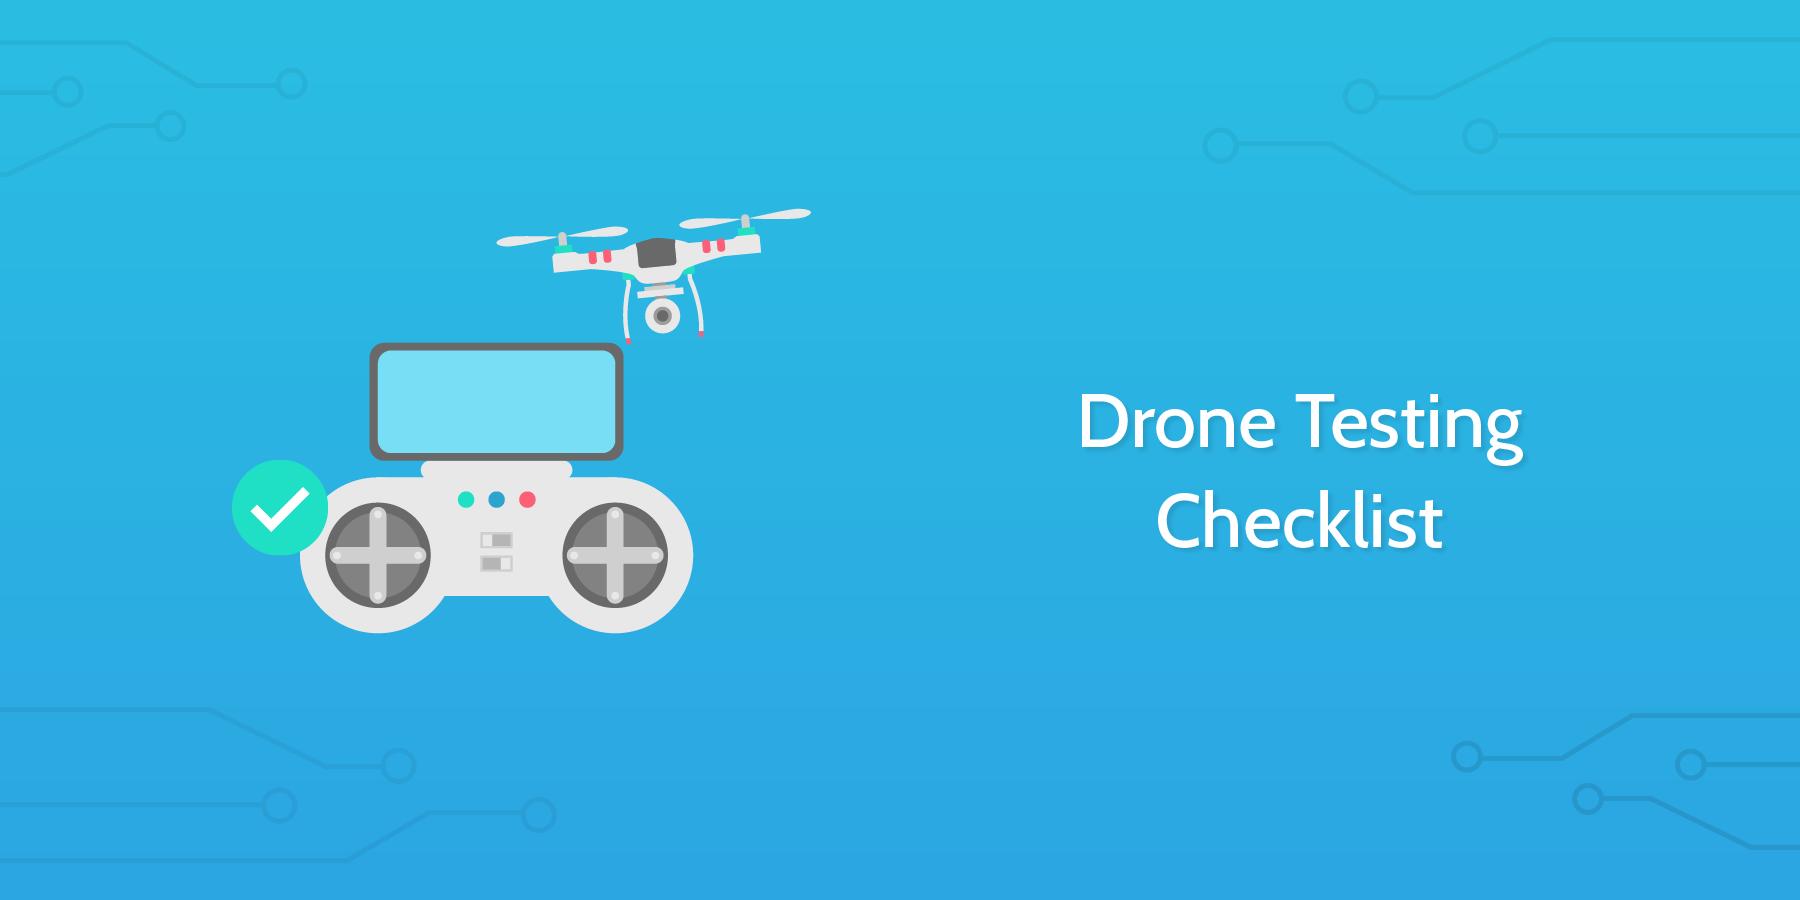 Drone Testing Checklist